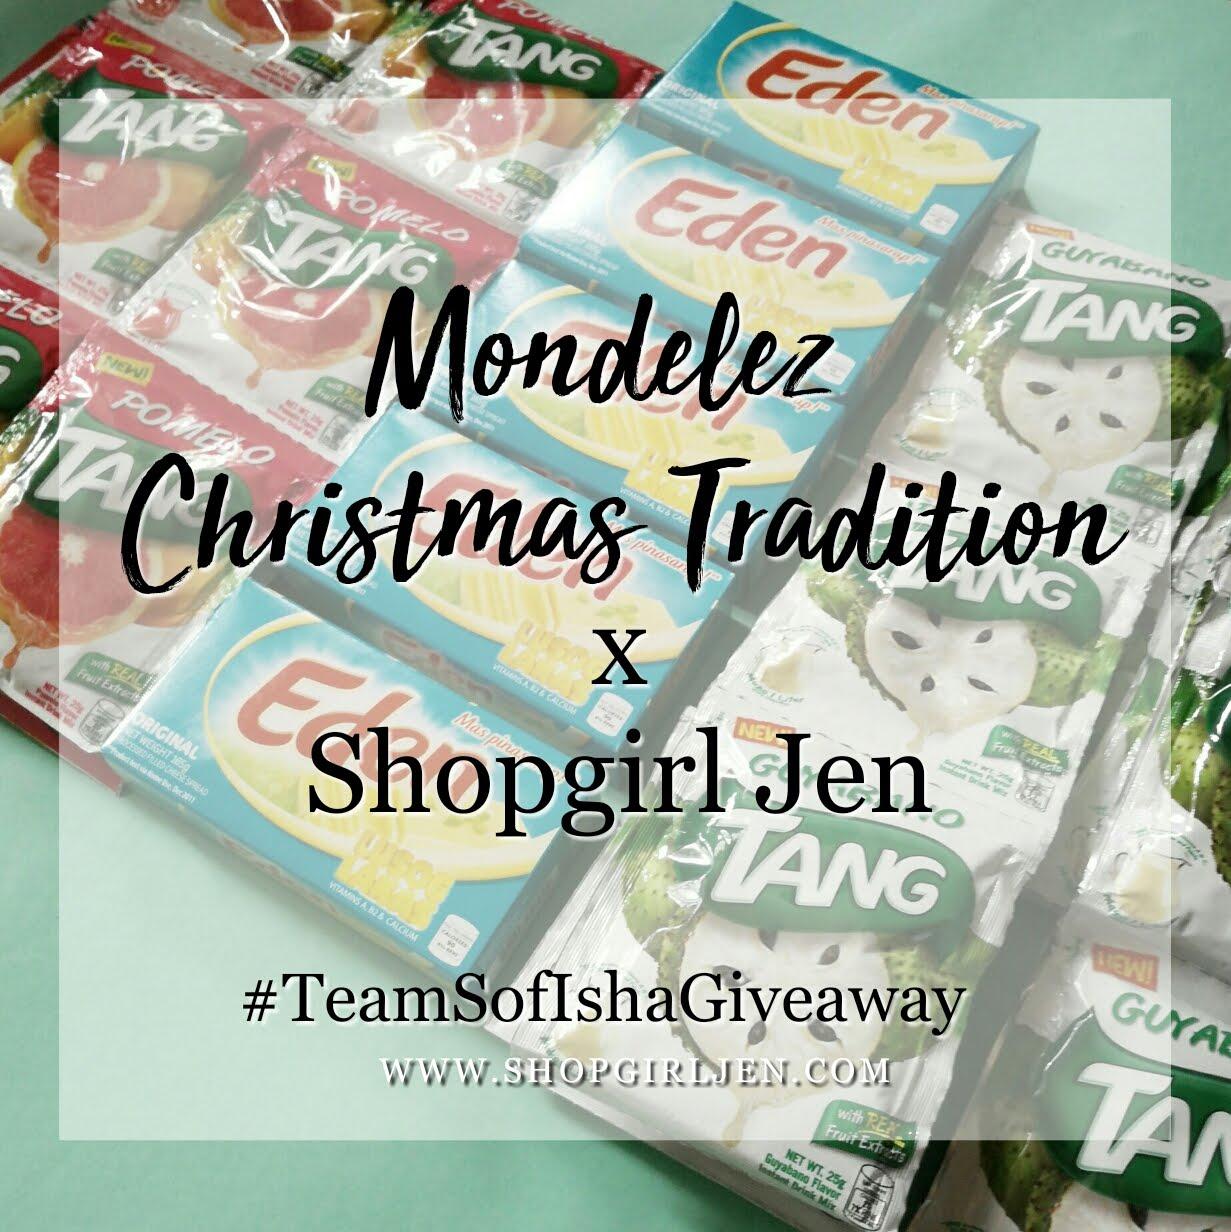 MondelezXShopgirlJen Giveaway